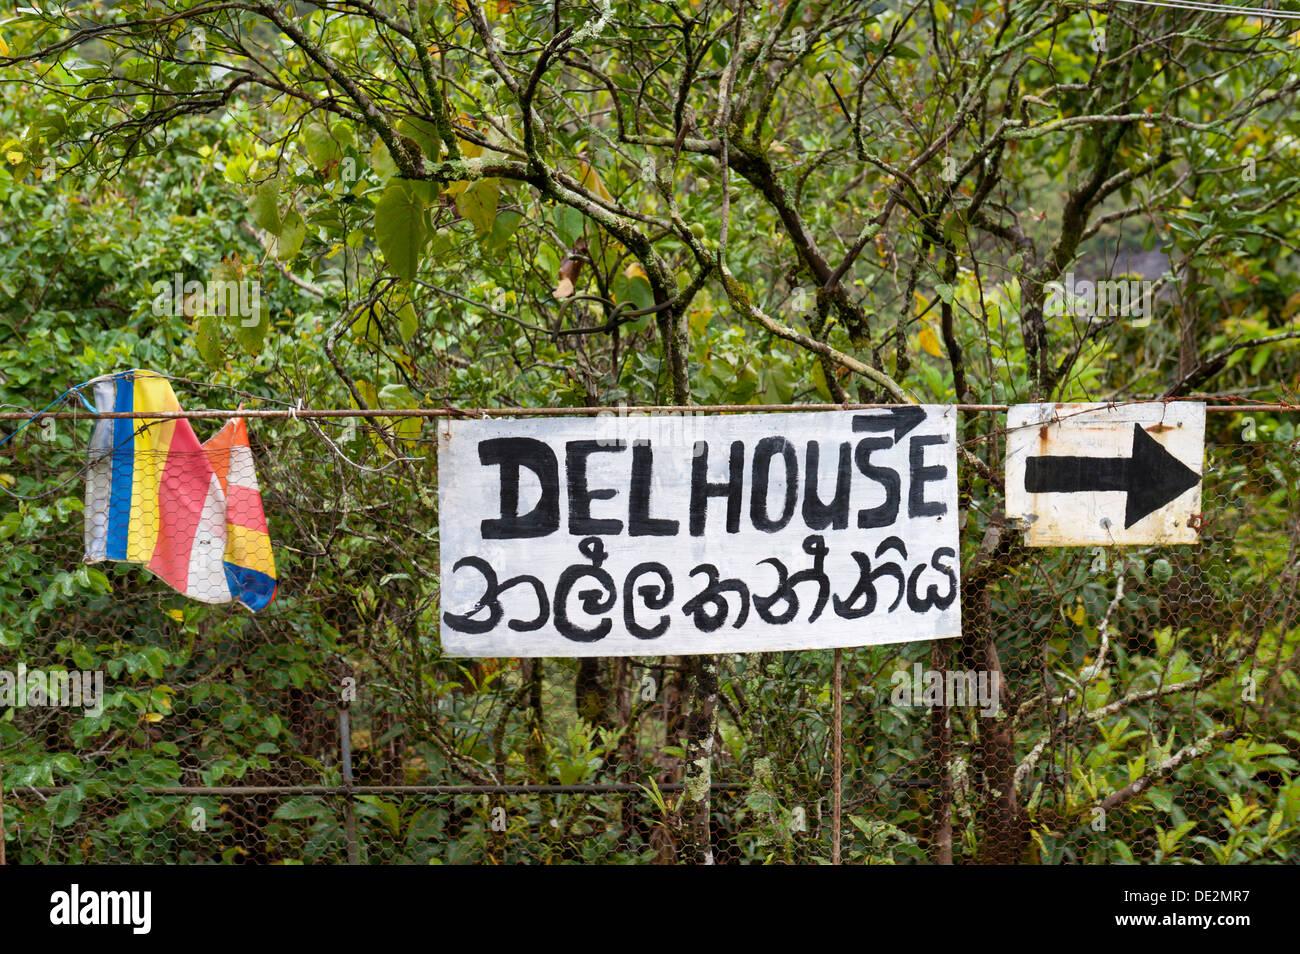 Pilgrimage path, signpost and arrow, road to Delhouse, Dalhousie, Adam's Peak, Sri Pada, Dalhousie, Zentrales - Stock Image